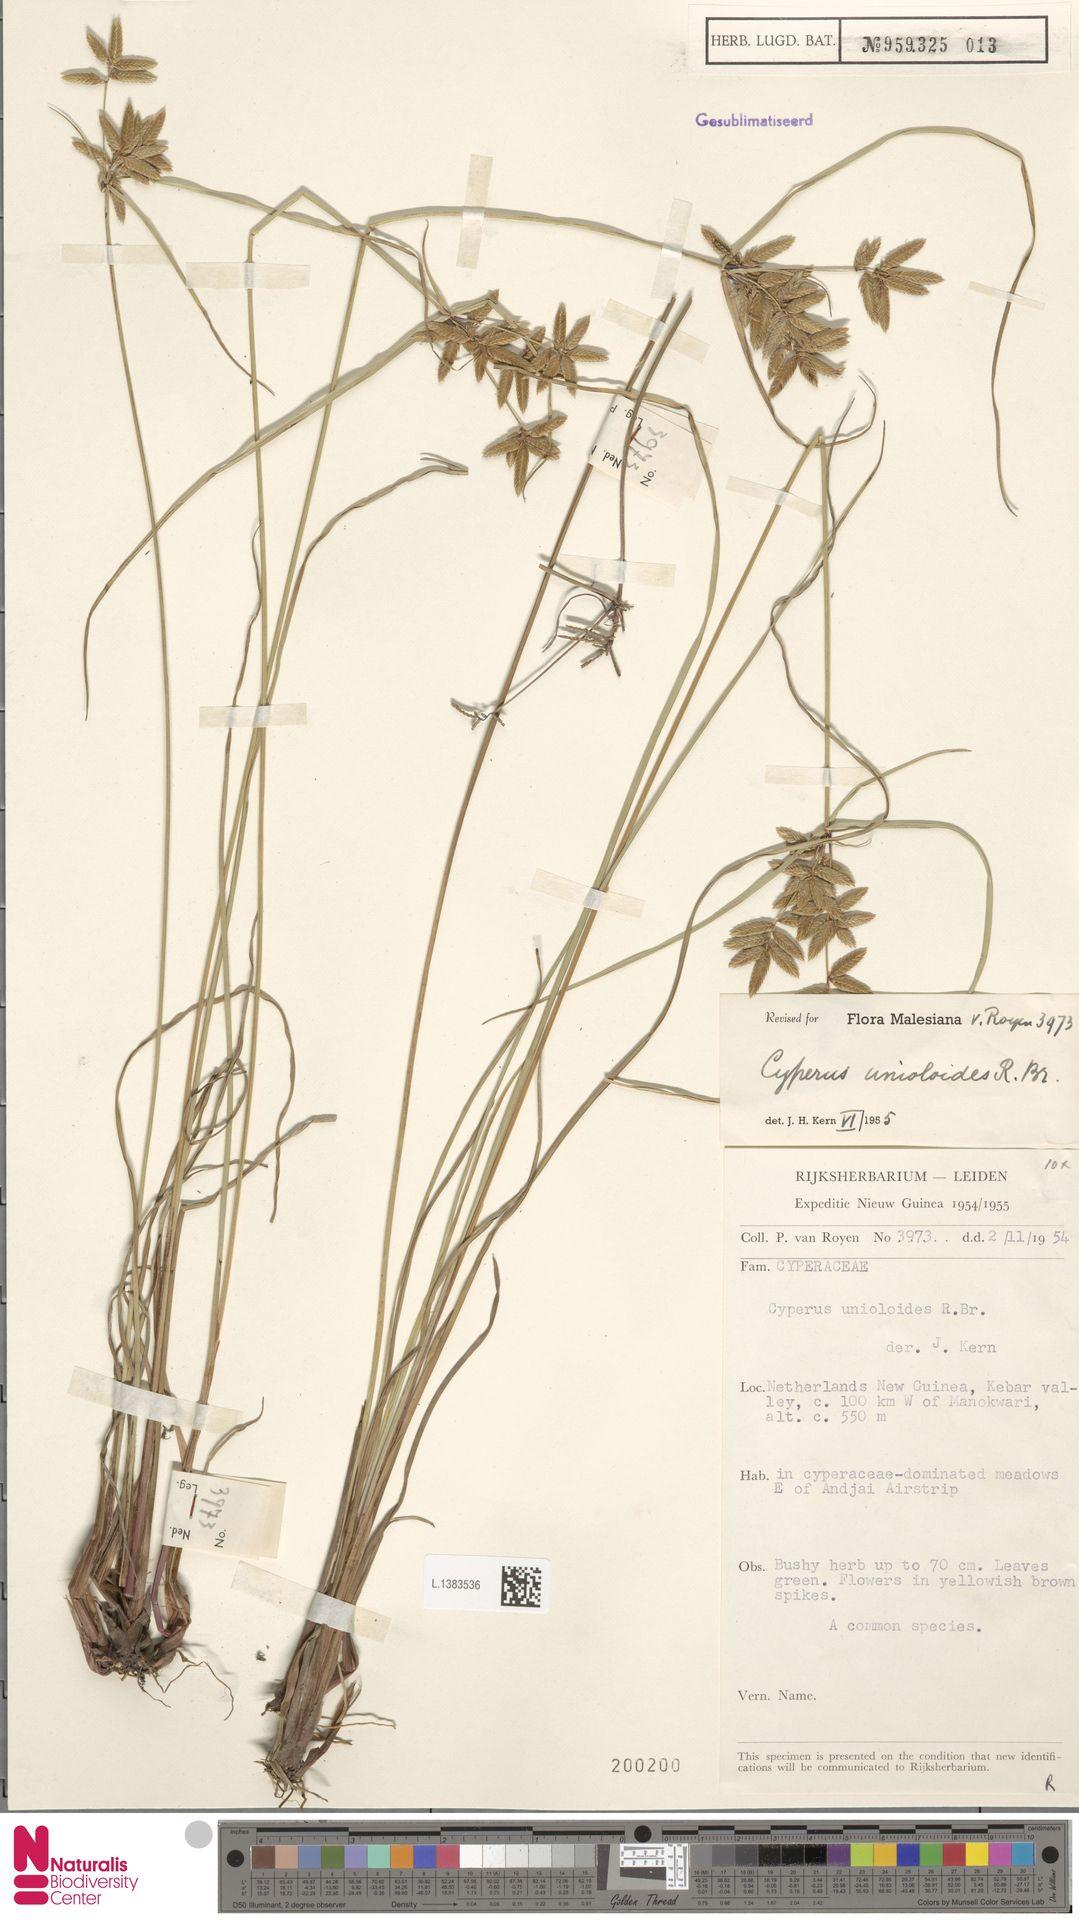 L.1383536 | Cyperus unioloides R.Br.